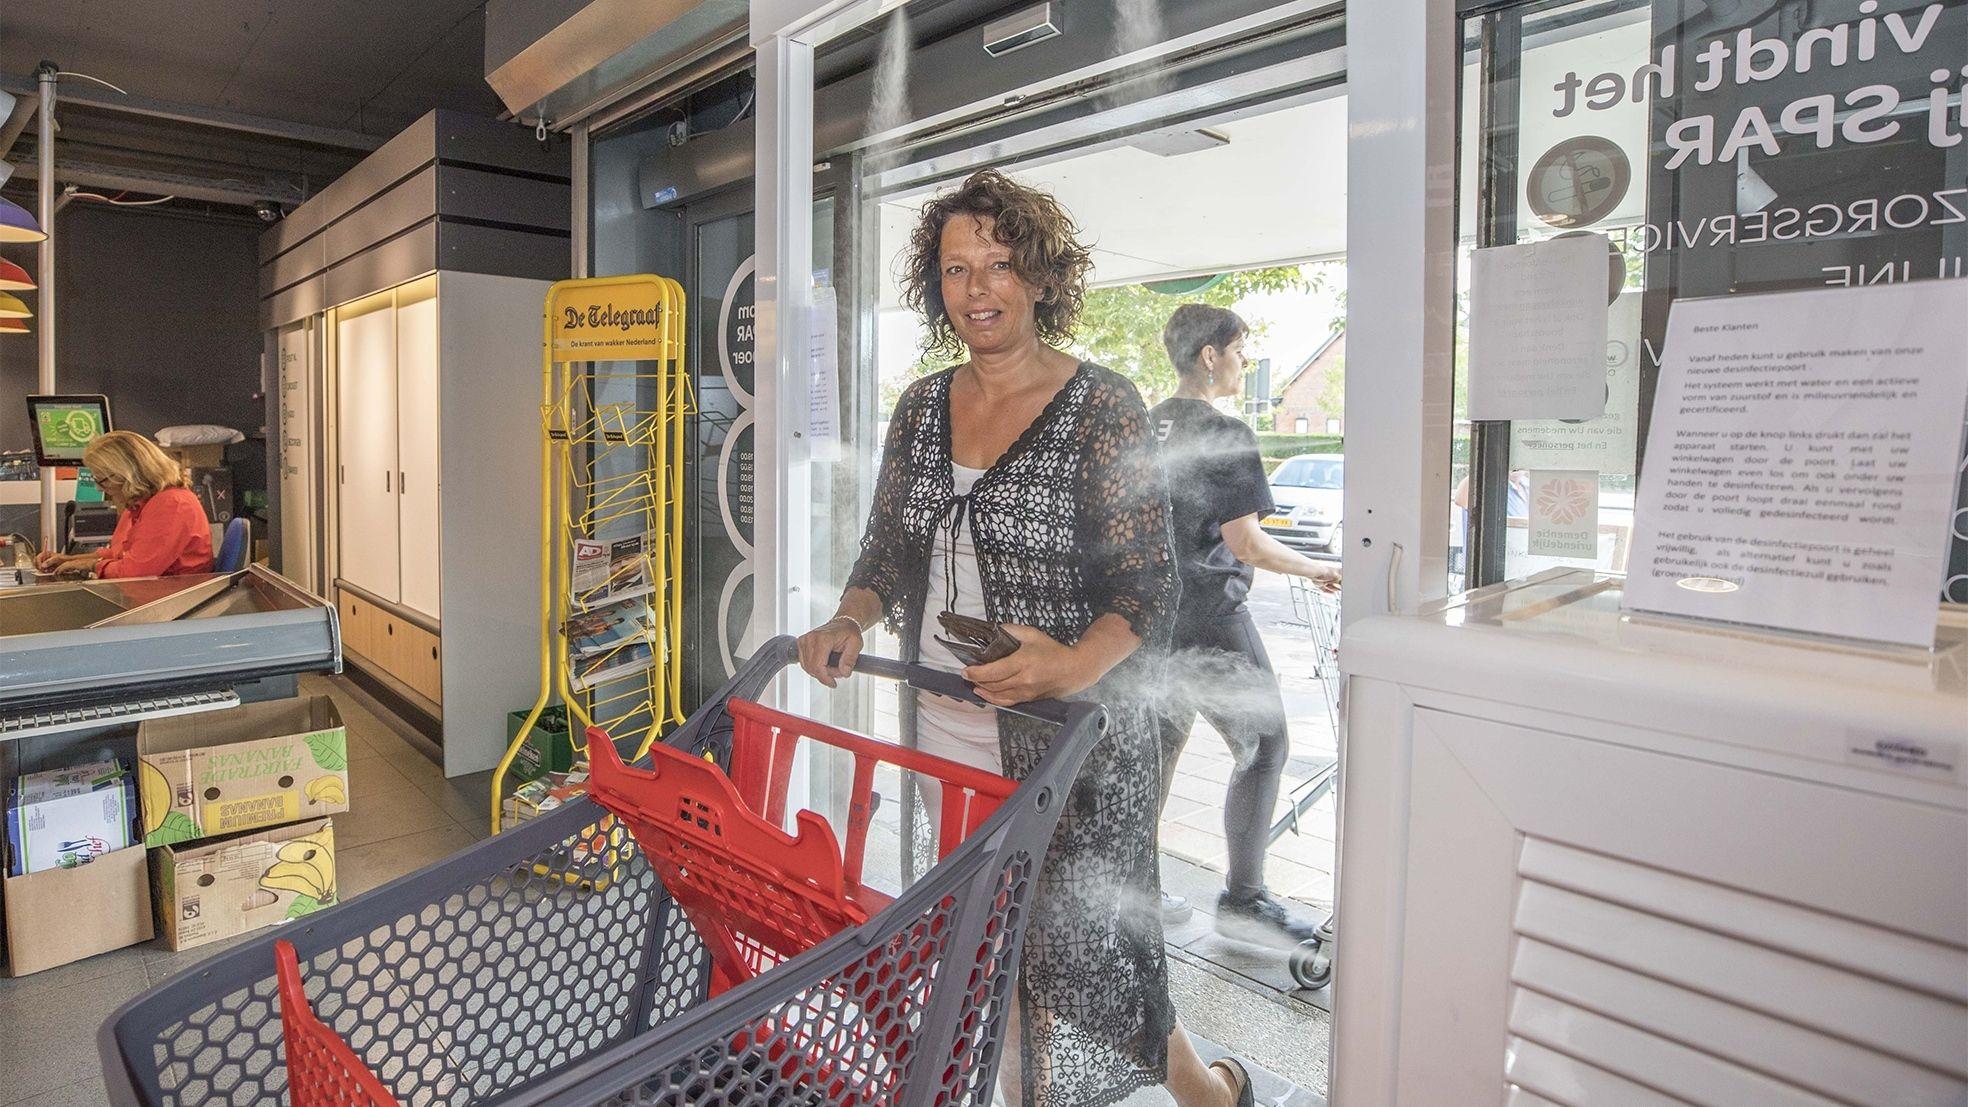 Veilig spar supermarkt wemeldinge corona